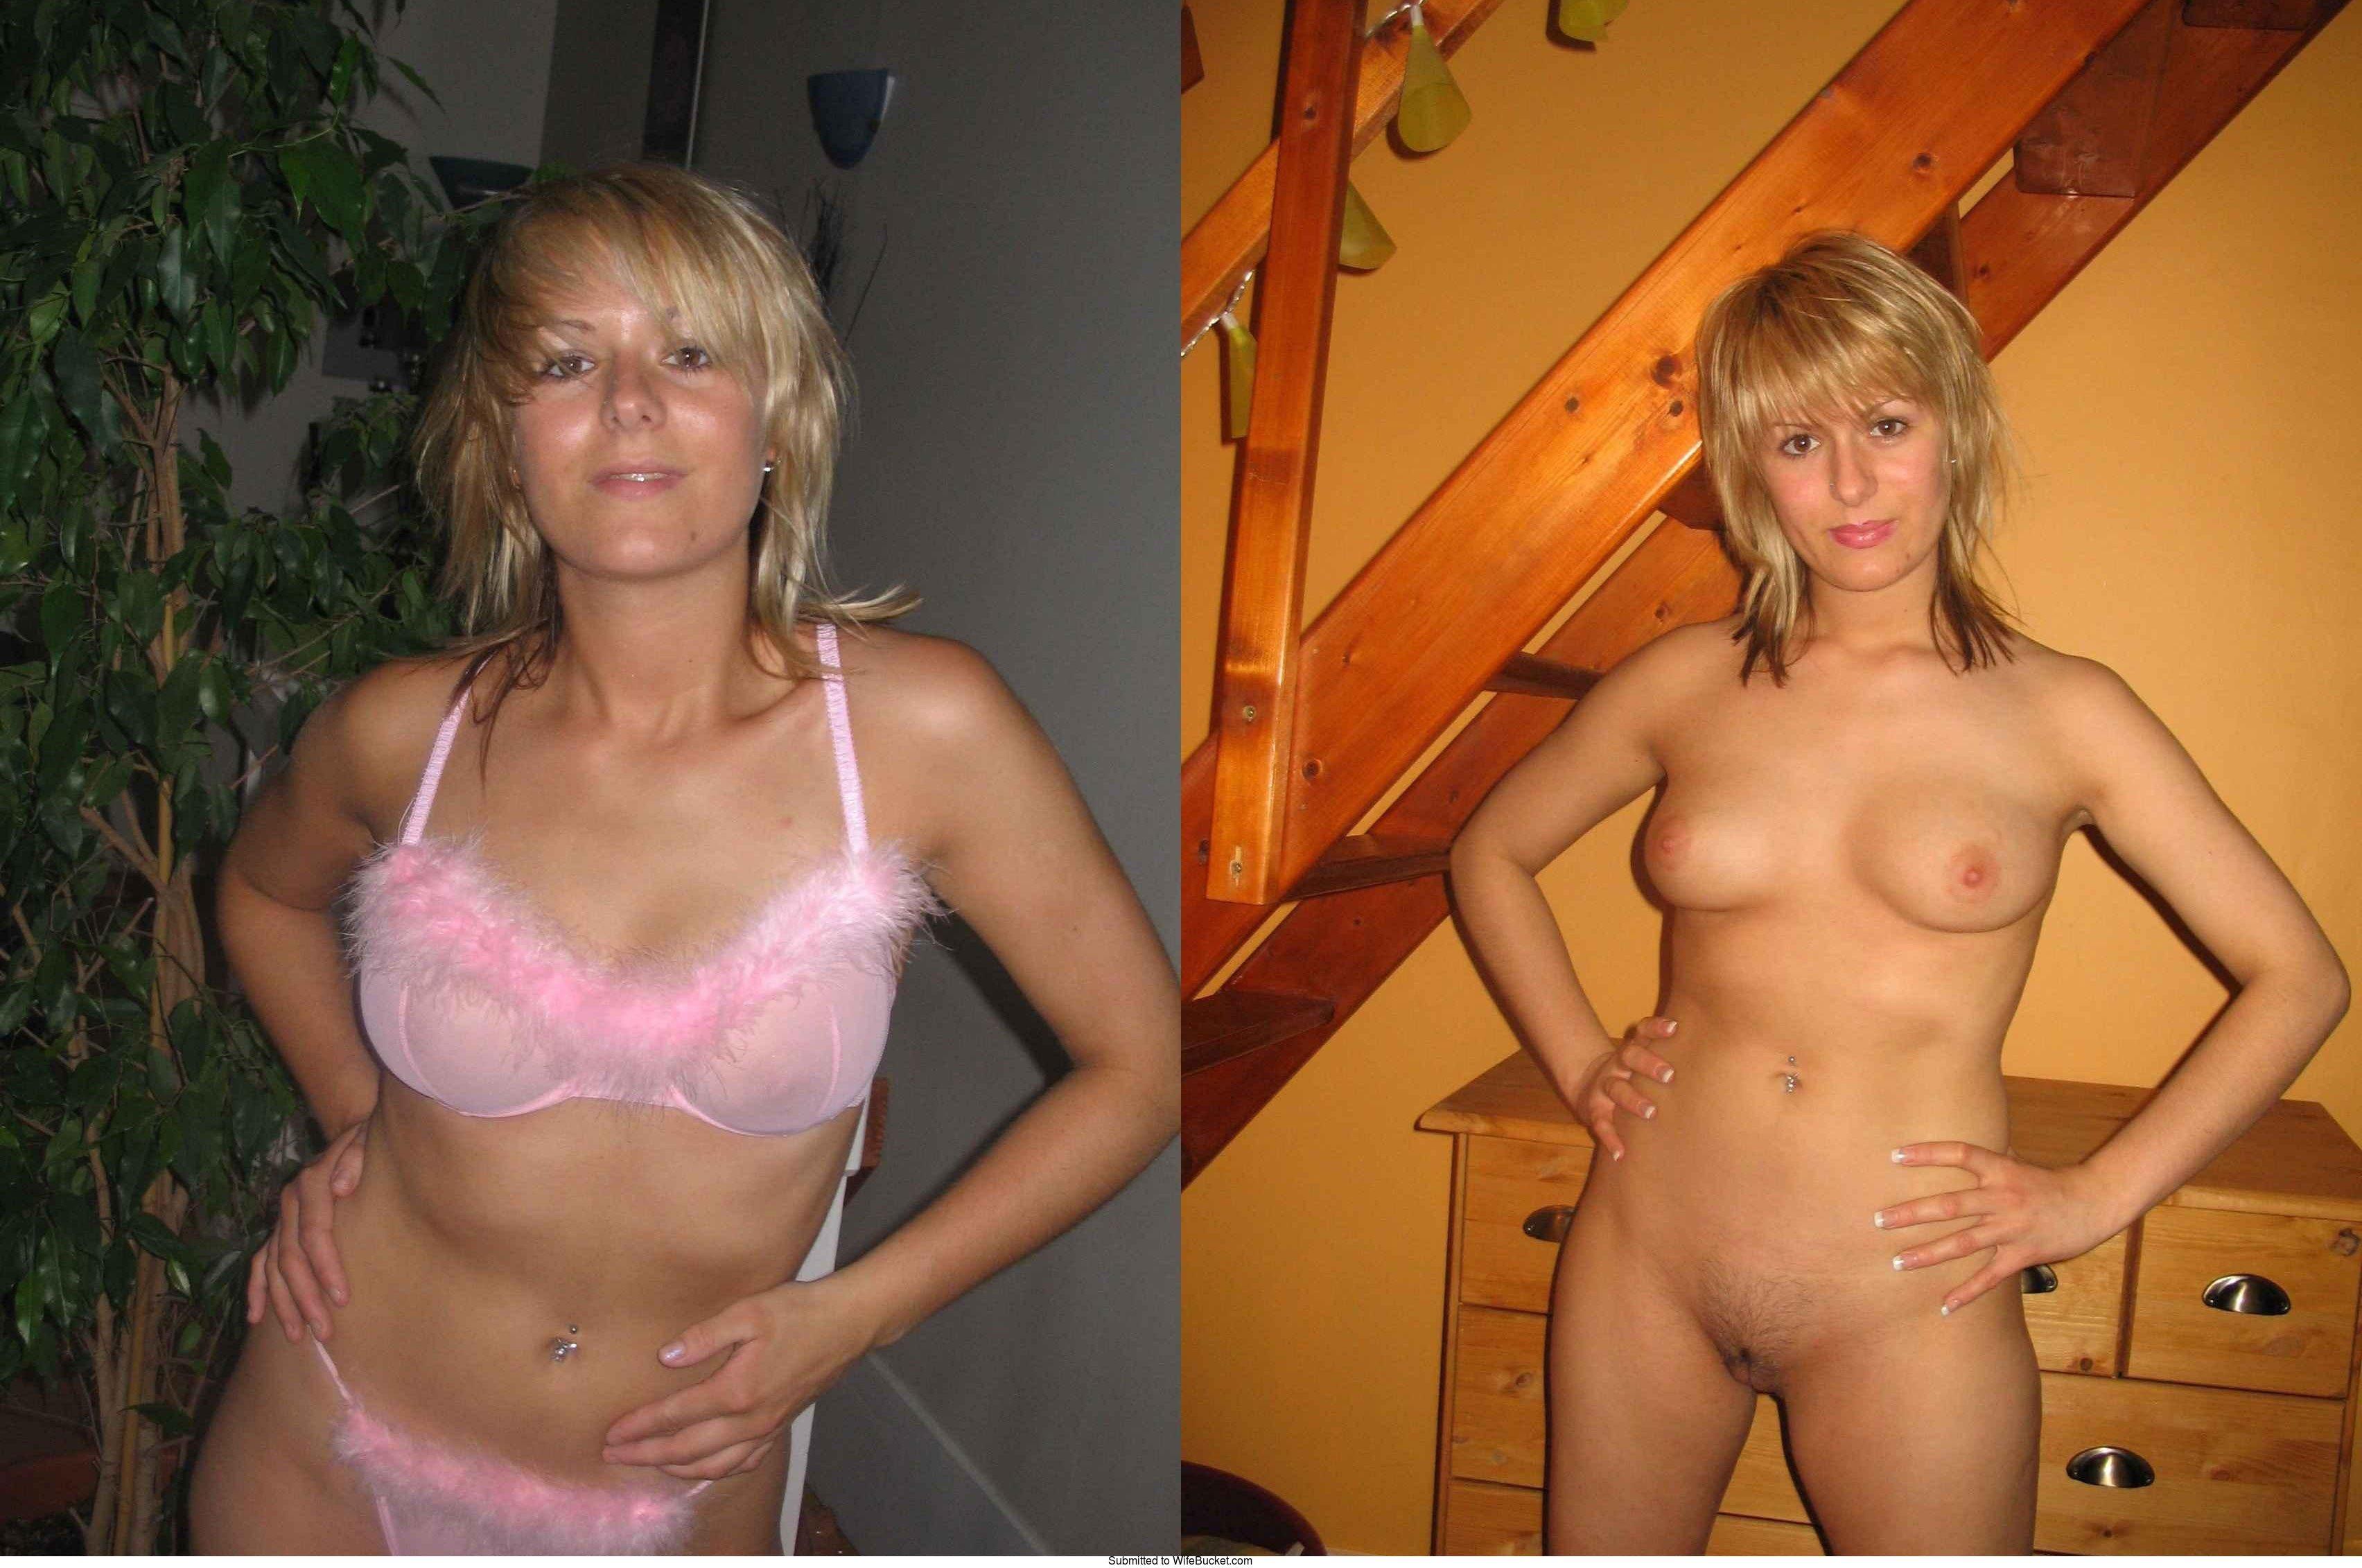 Dressed undressed clothed unclothed amateur